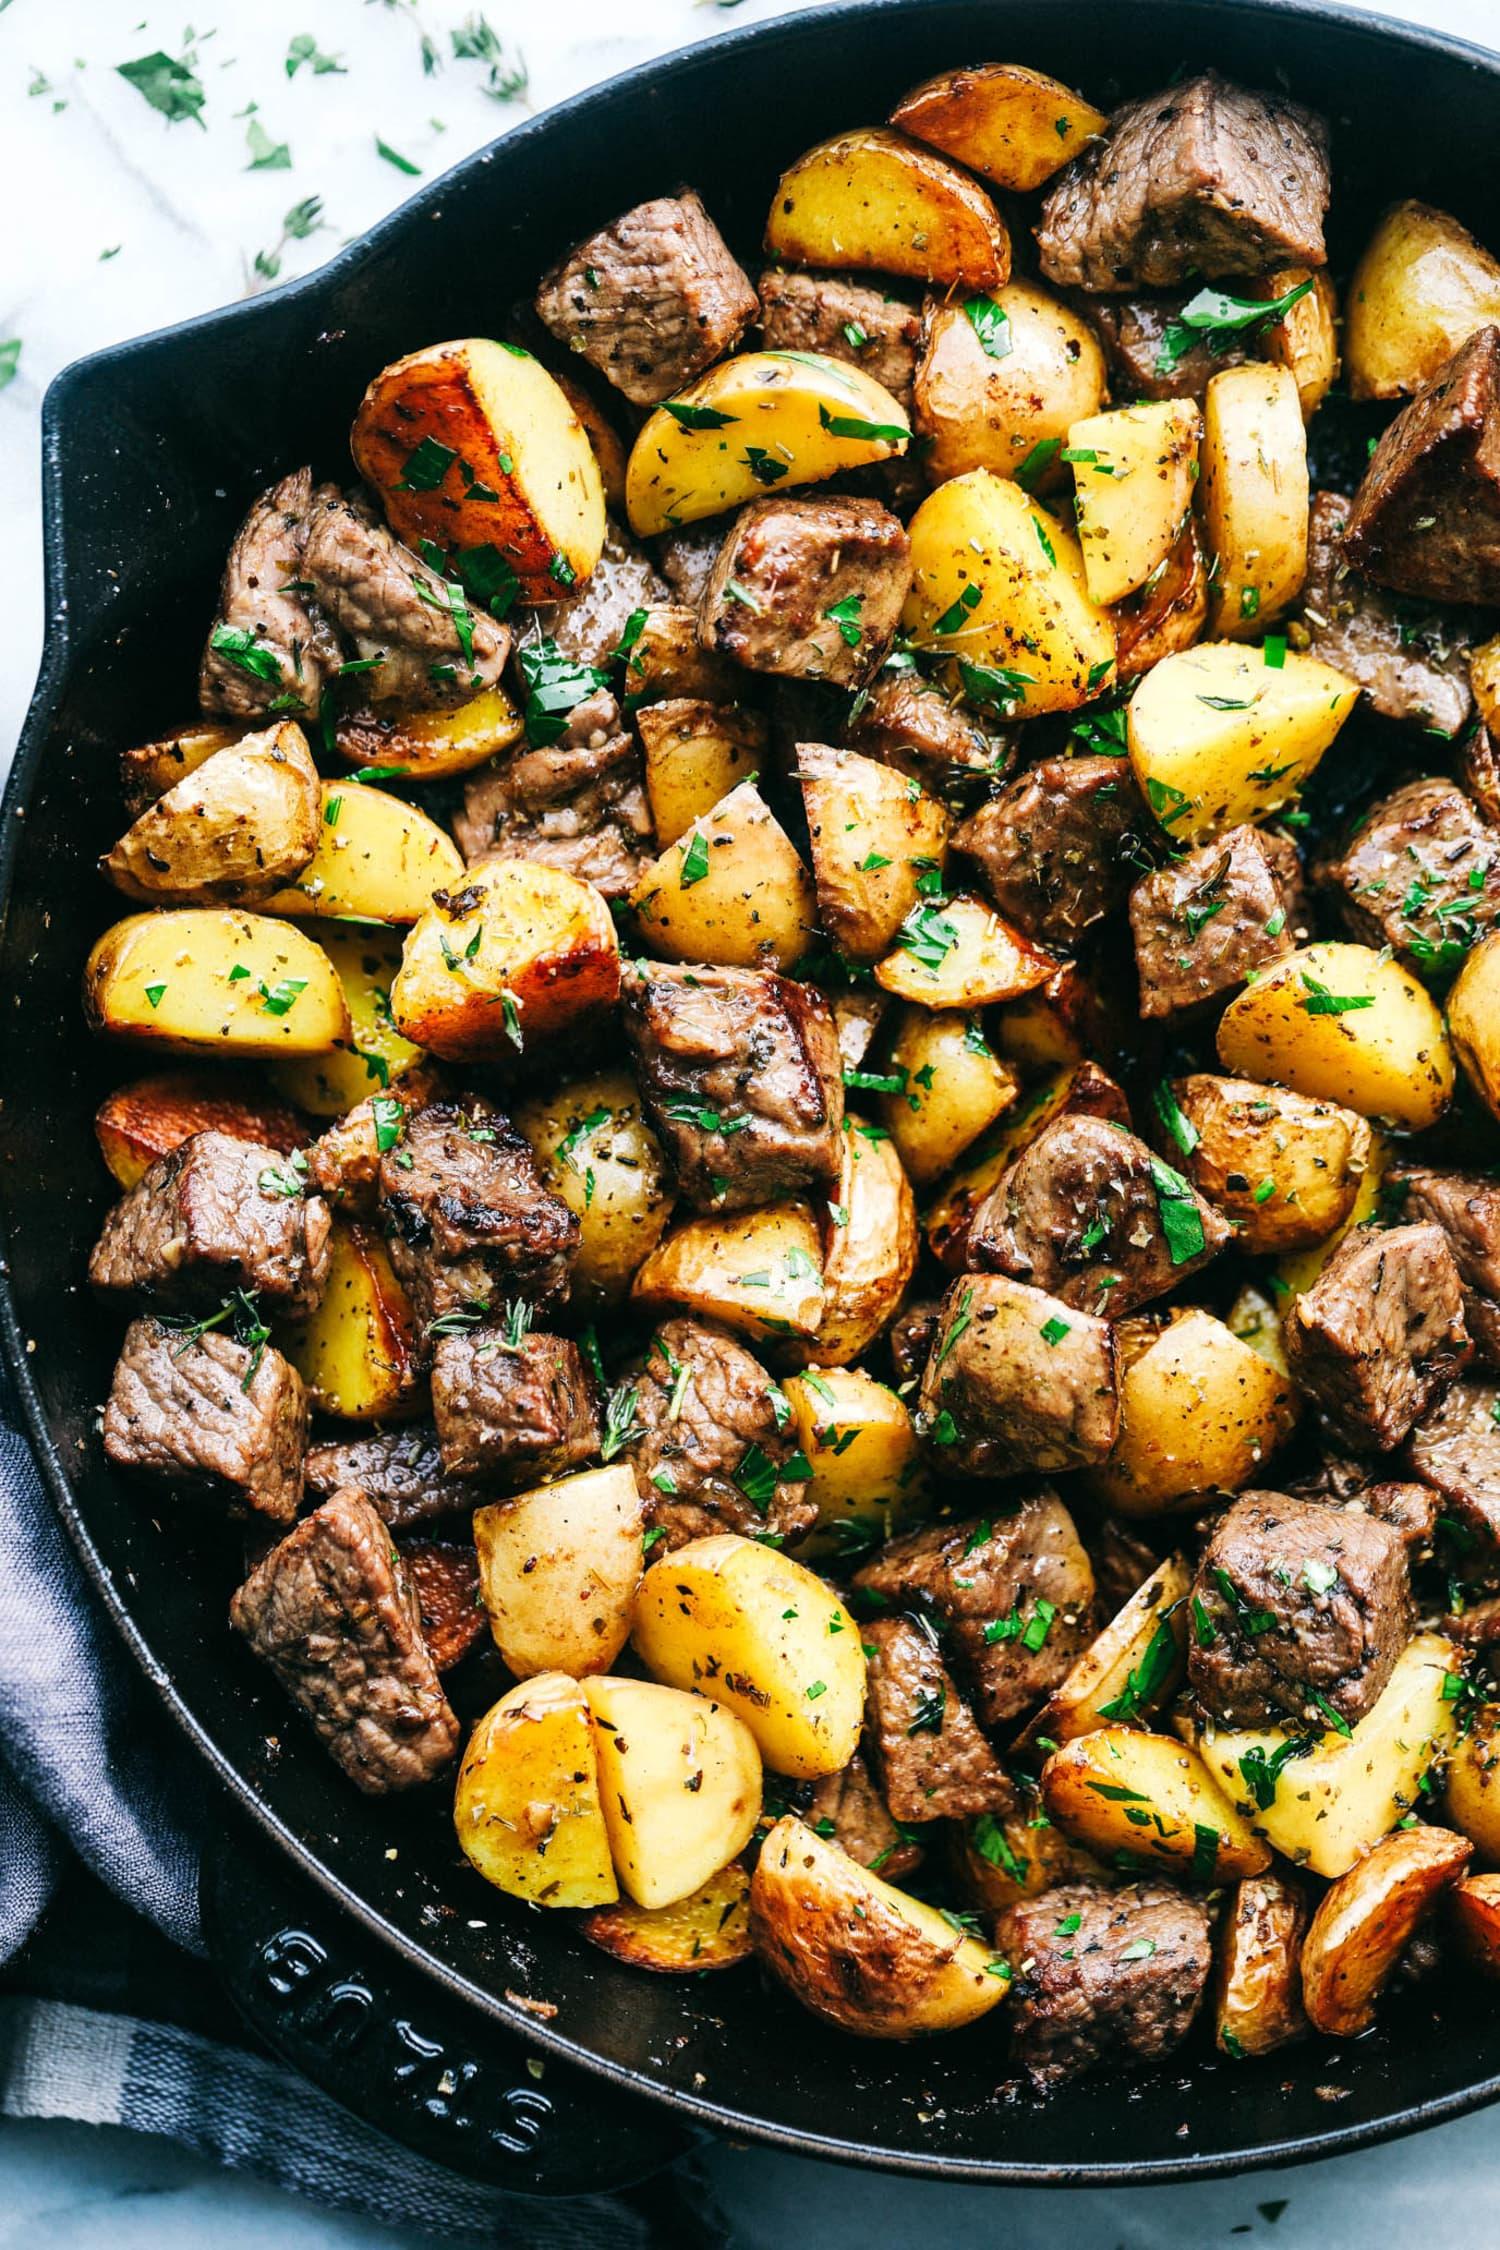 Treat Yourself to Garlic Butter Herb Steak Bites Tonight